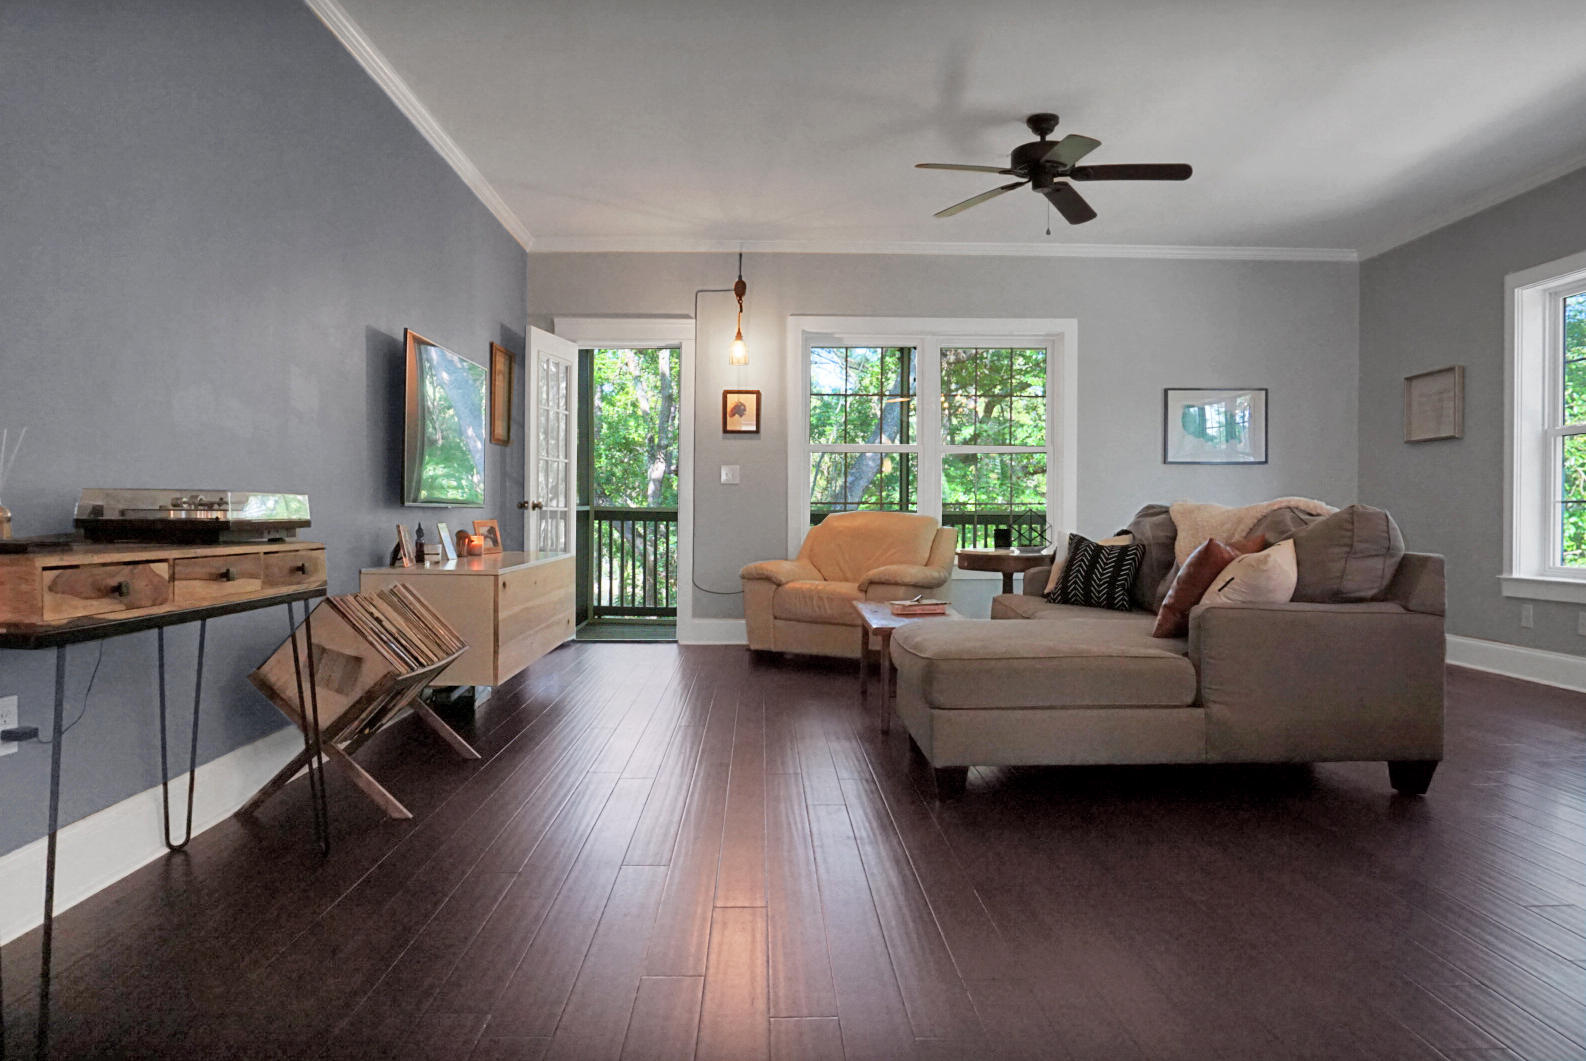 Etiwan Pointe Homes For Sale - 269 Etiwan Pointe, Mount Pleasant, SC - 49